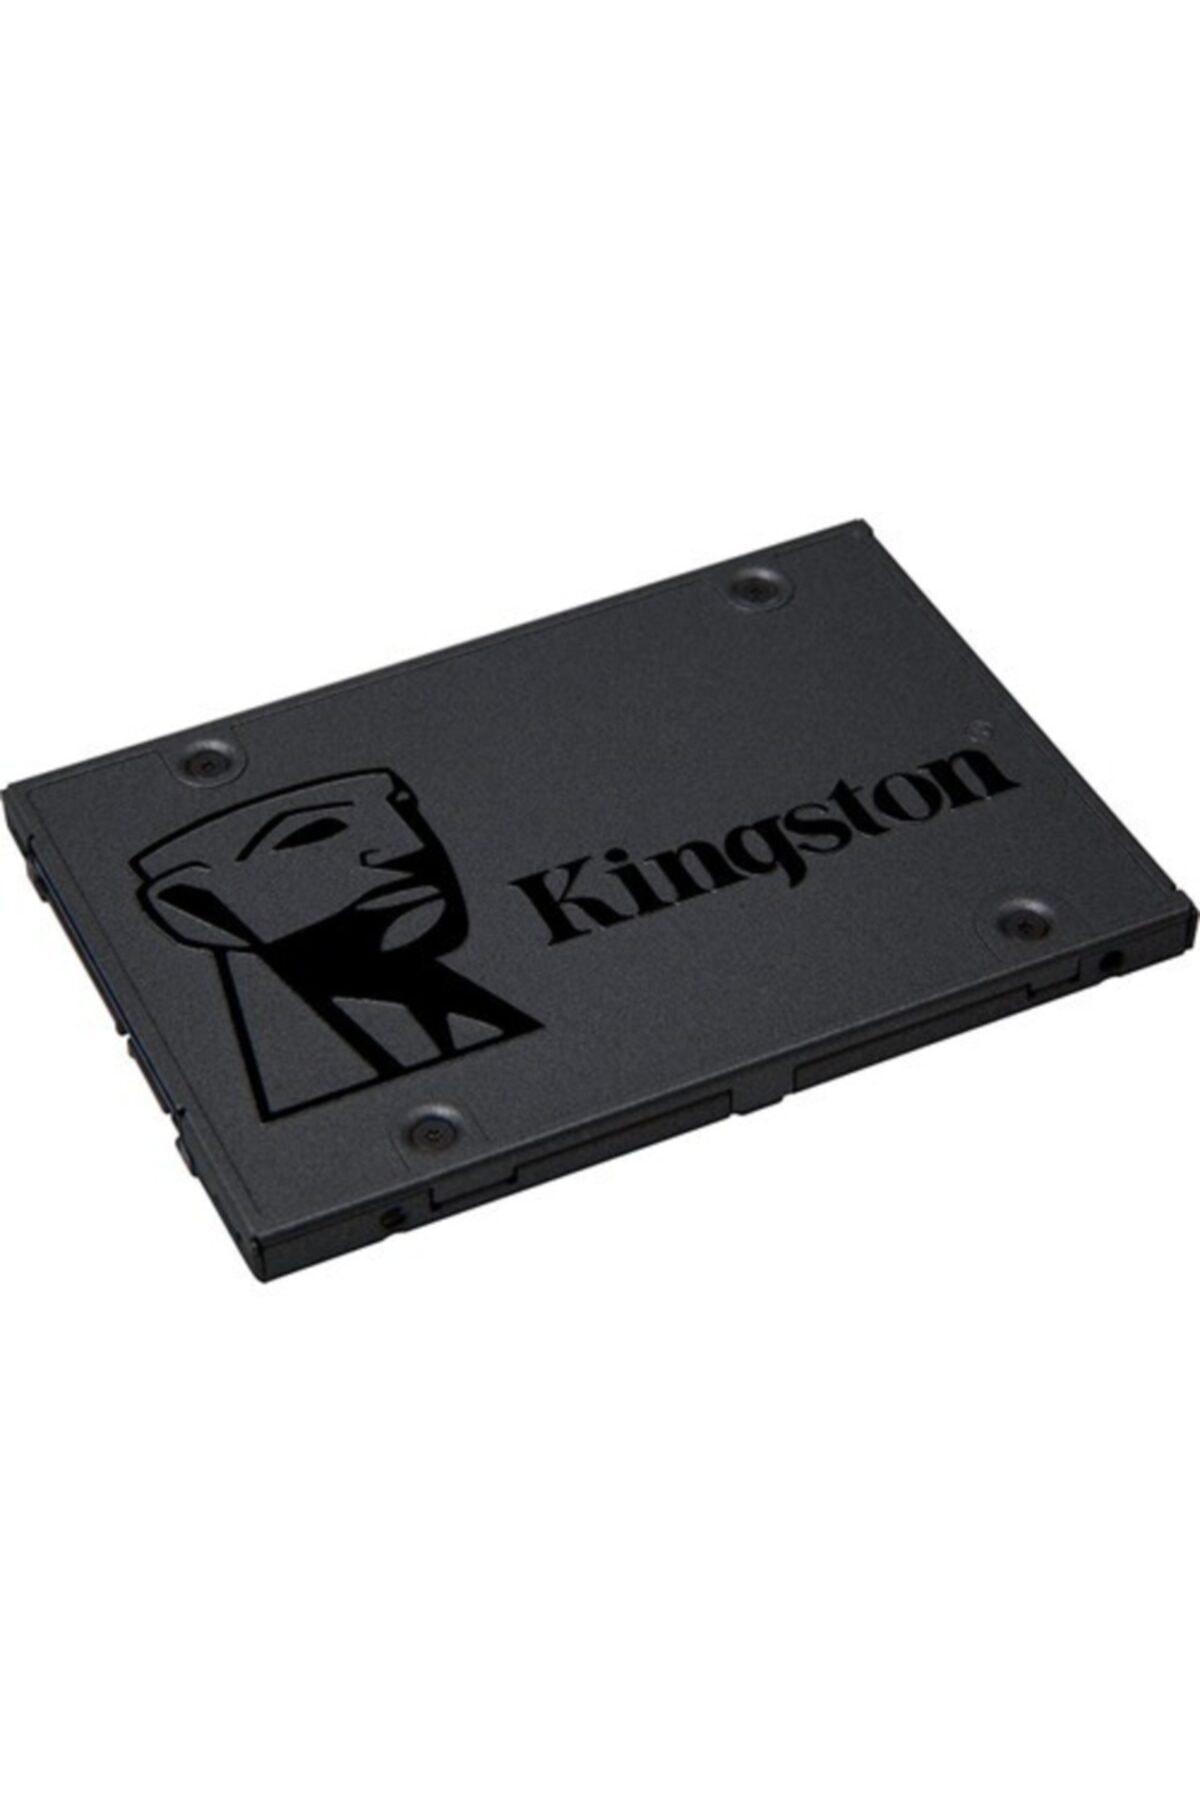 Kingston A400 Ssdnow 120gb 500mb-320mb/s Sata3 2.5 Ssd Sa400s37/120g 2